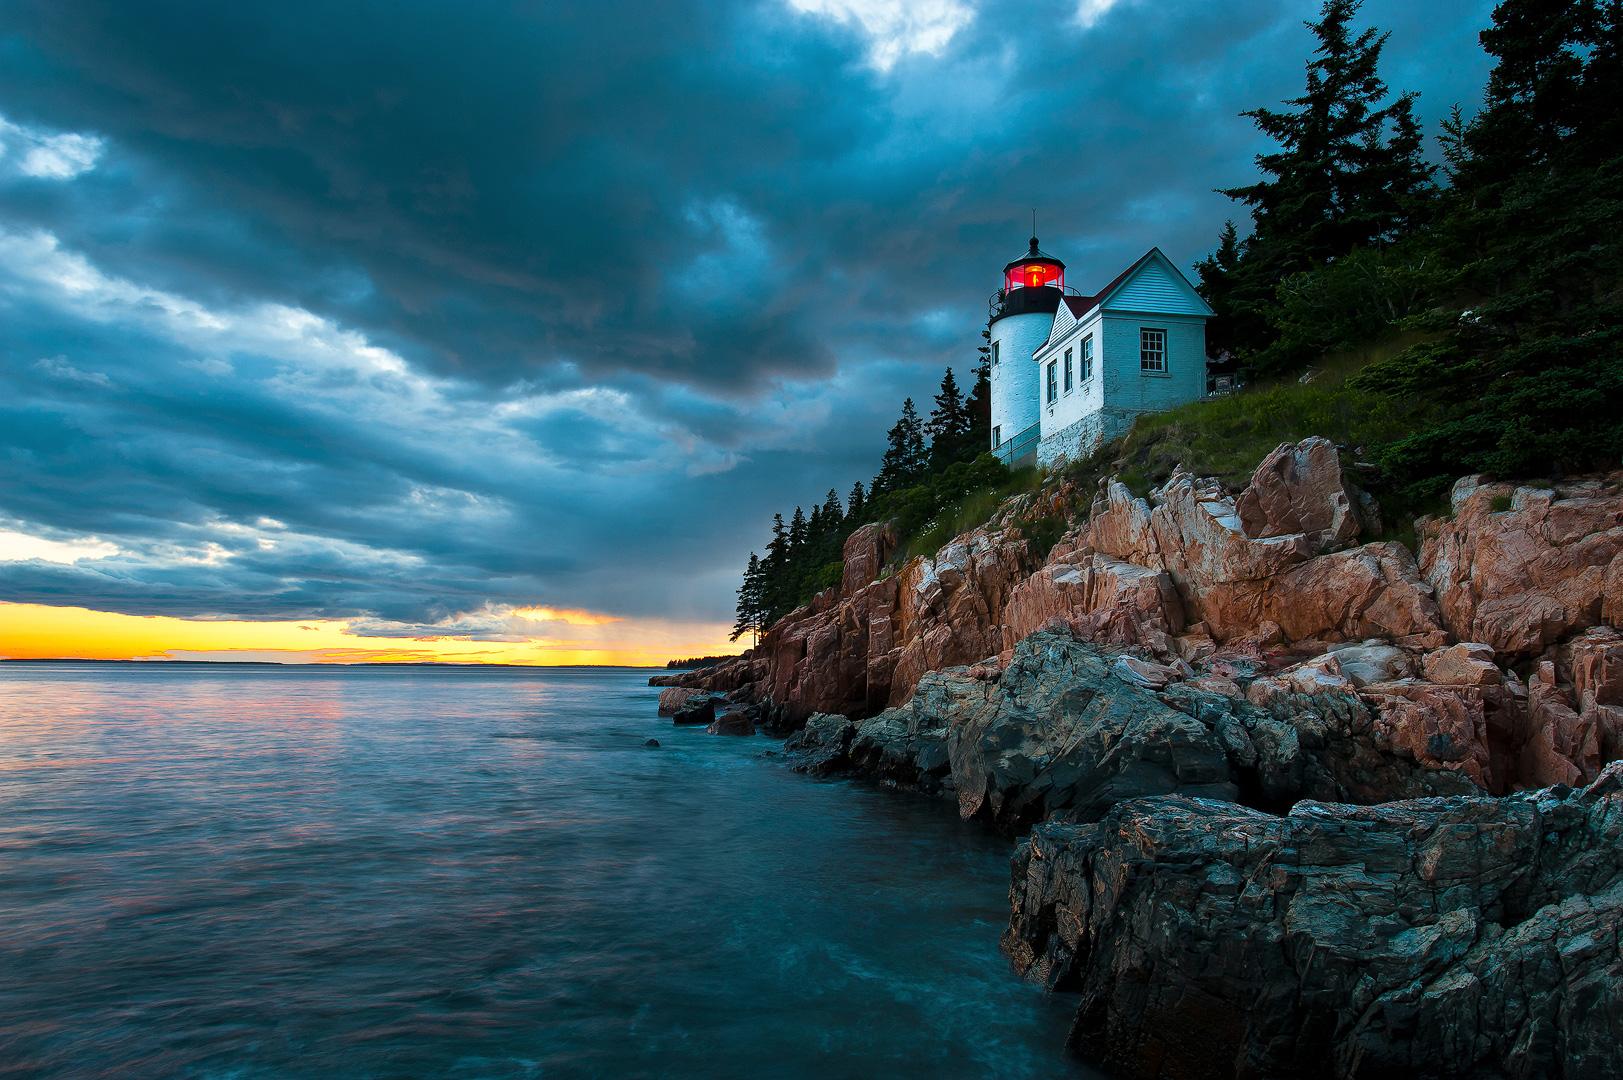 Atlantic, ocean, acadia, national, park, beach, island, bernard chen, timescapes, bass harbor, lighthouse, Mount Desert Island...